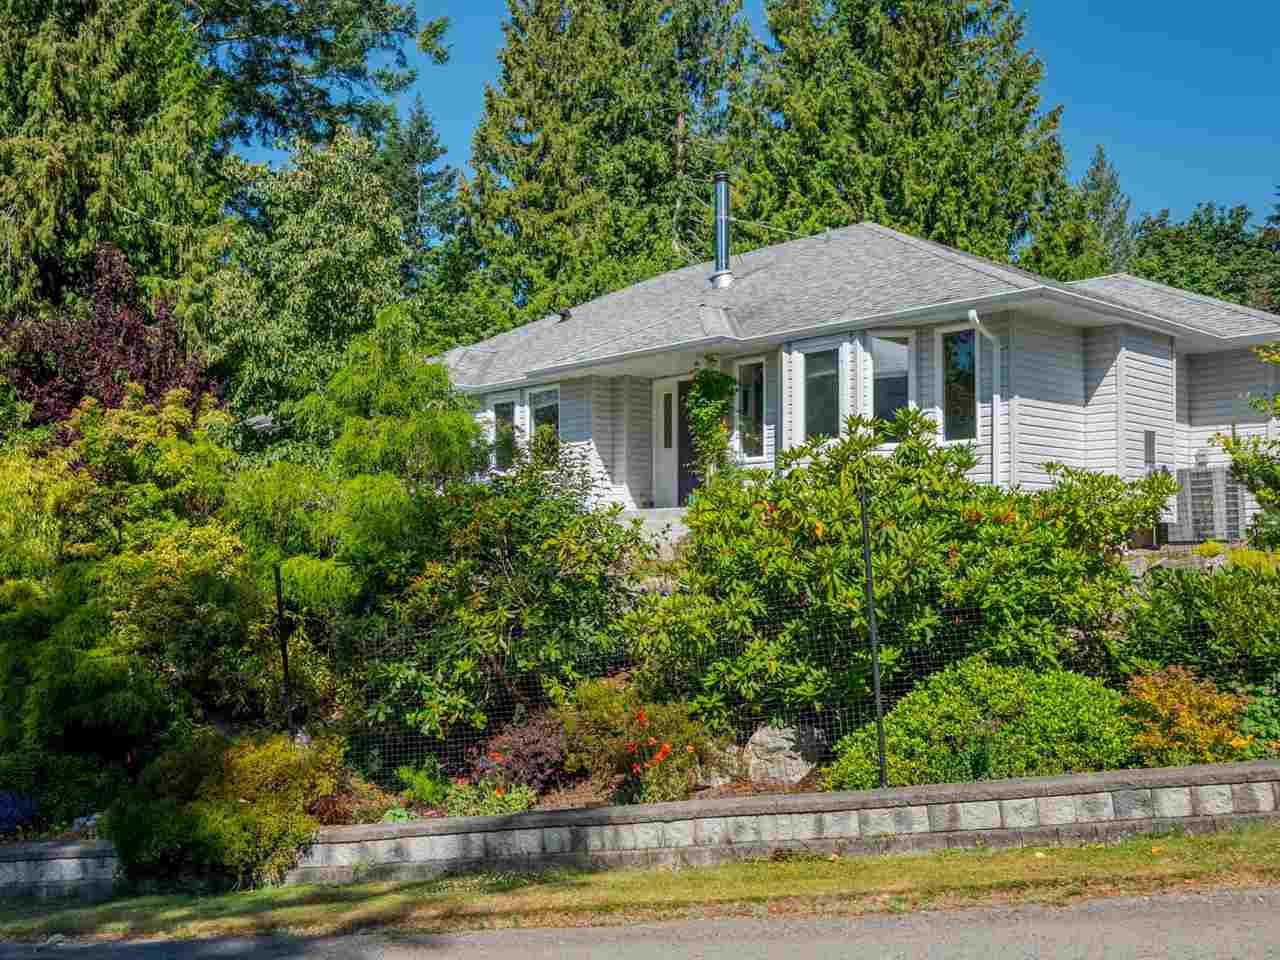 Main Photo: 4635 GERRANS BAY Road in Madeira Park: Pender Harbour Egmont House for sale (Sunshine Coast)  : MLS®# R2343774